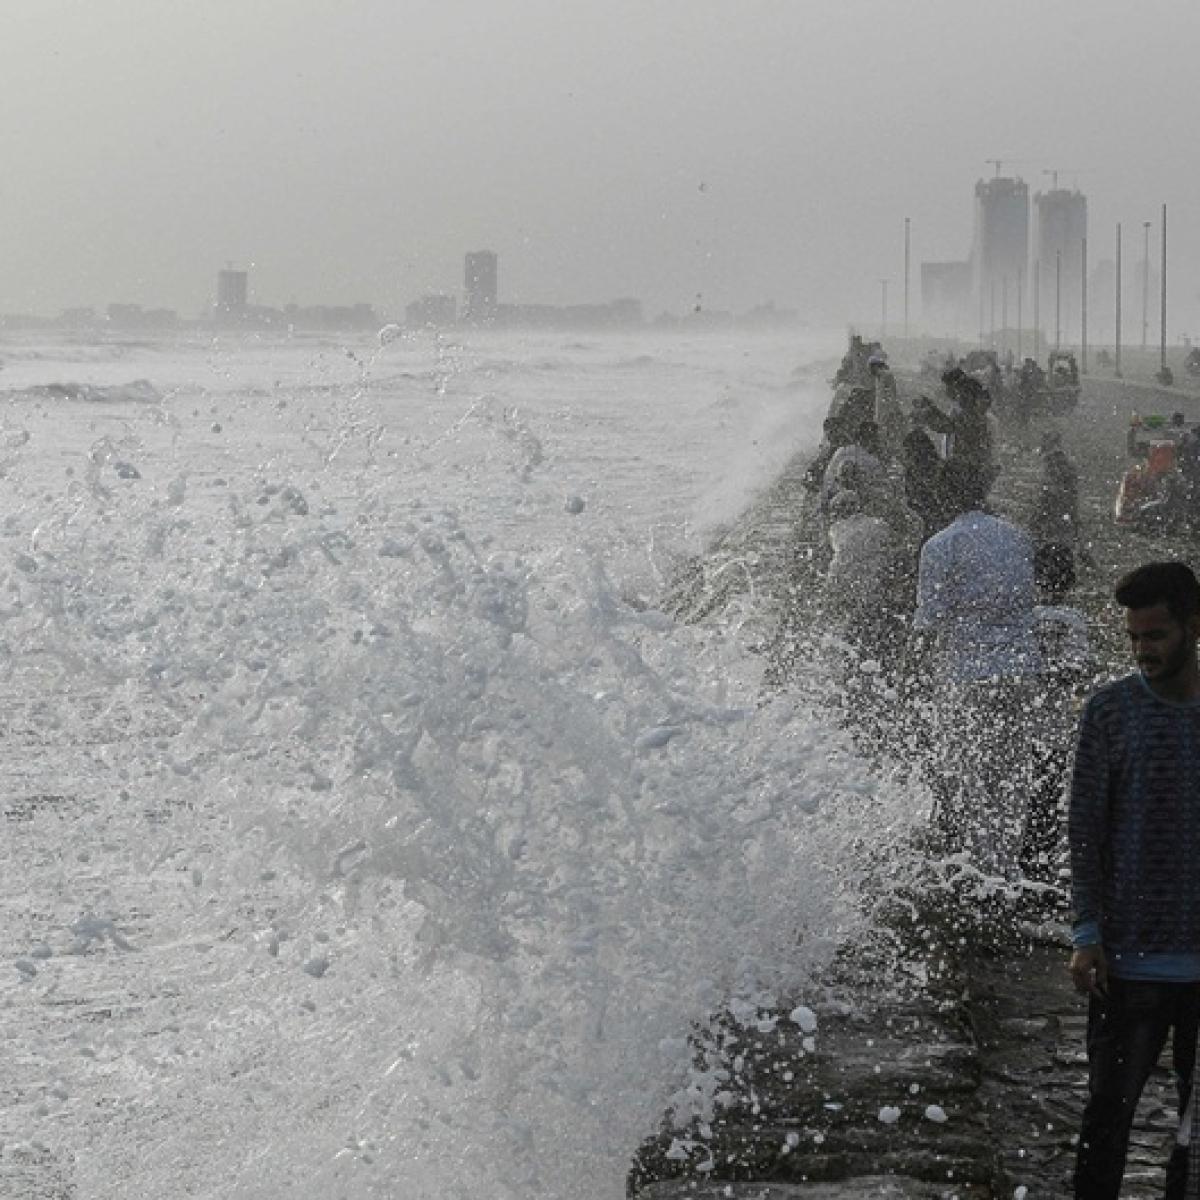 Cyclone Vayu crosses Gujarat coast, causes heavy rains